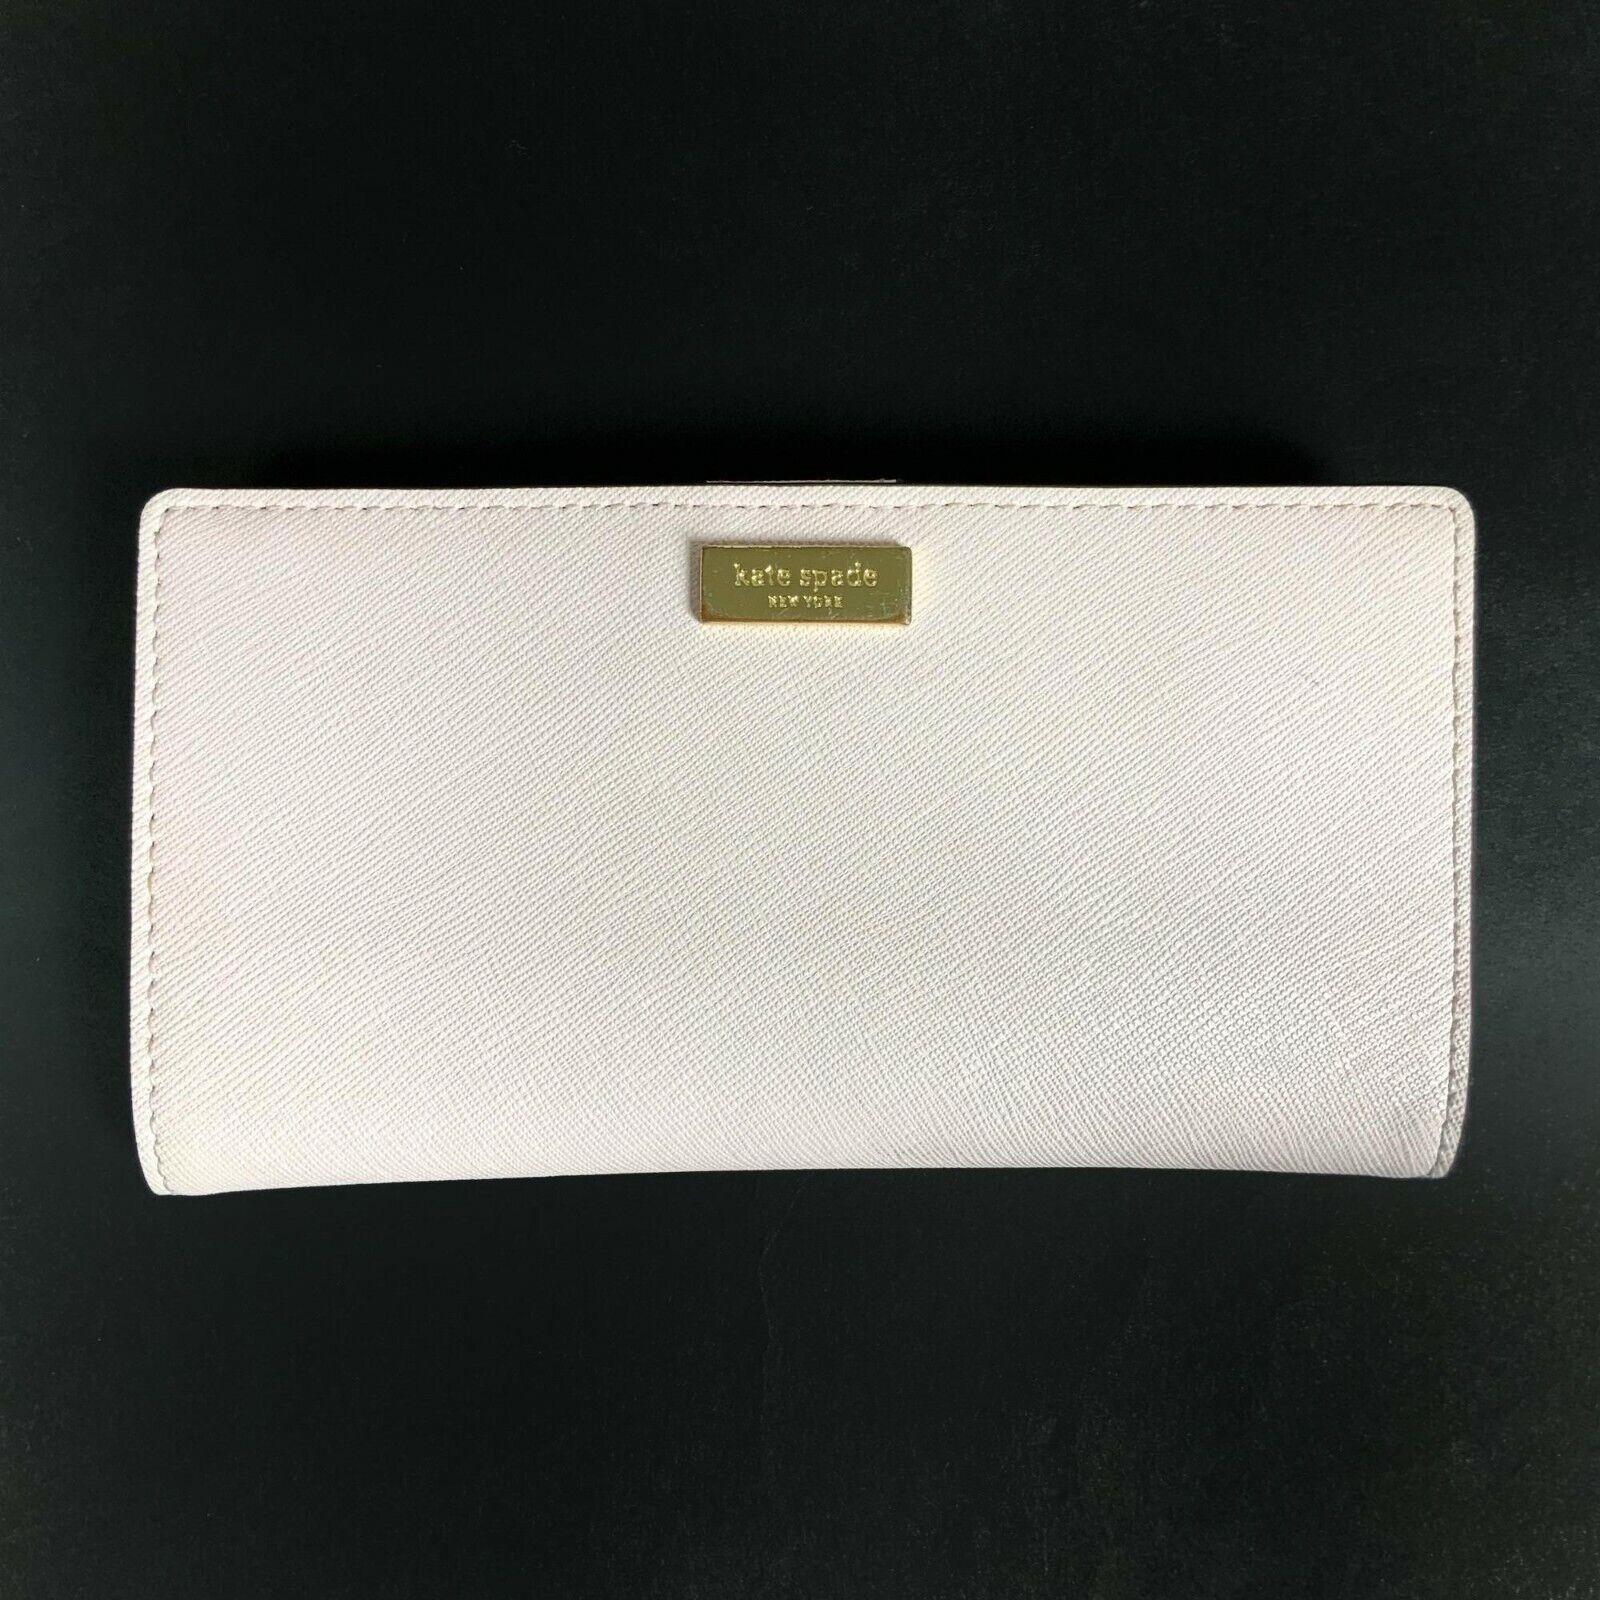 Kate Spade New York Darcy Slim Bifold Wallet Ballet Pink Leather Snap Closure